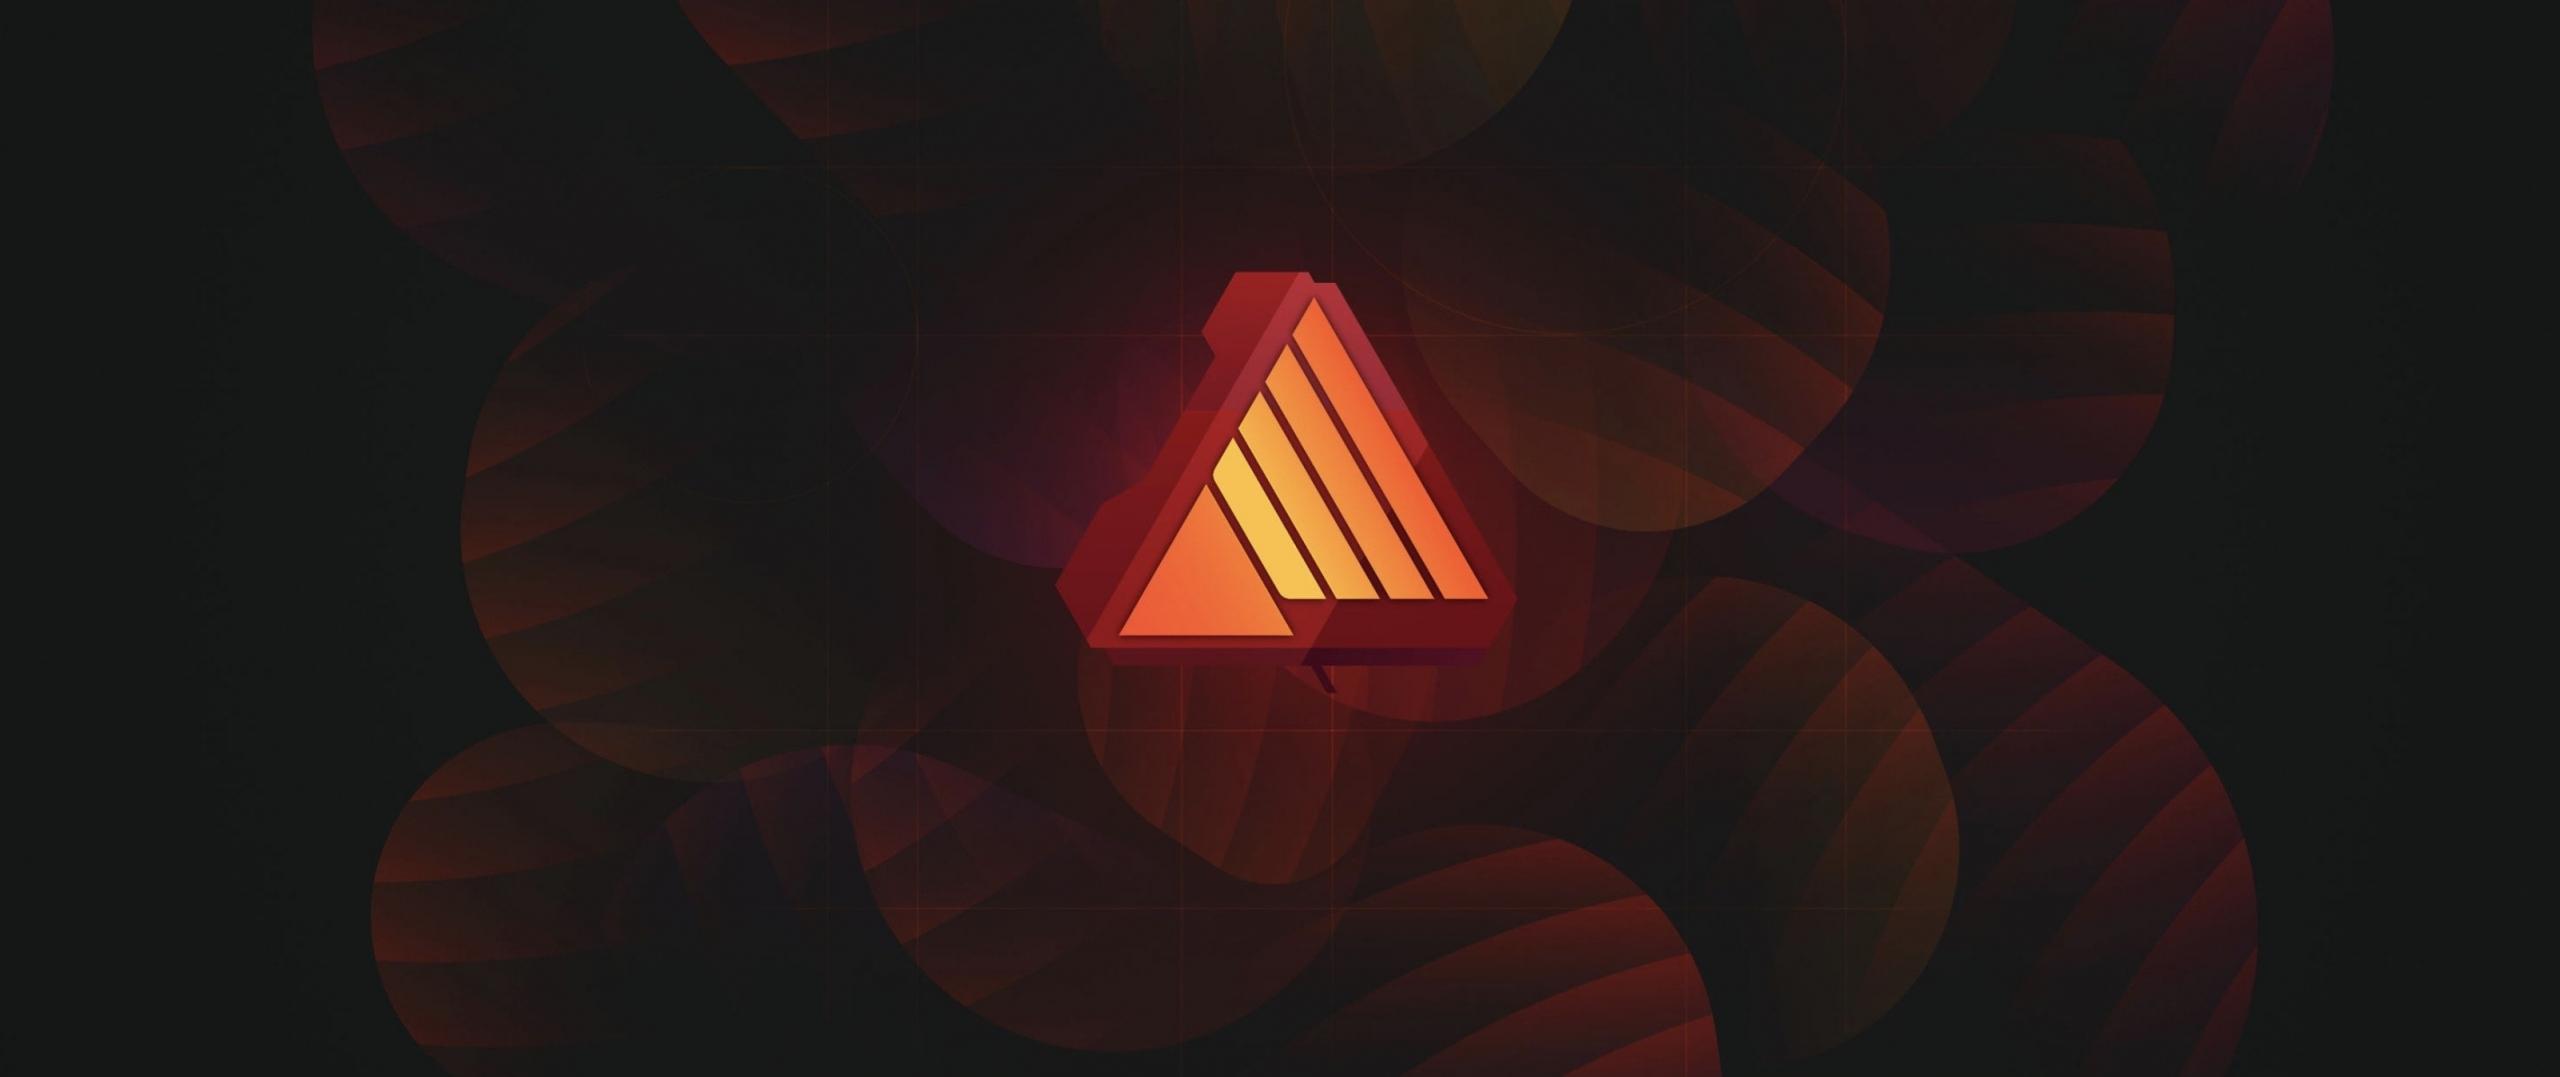 Affinity Publisher 1.8.2 出版物设计必备软件